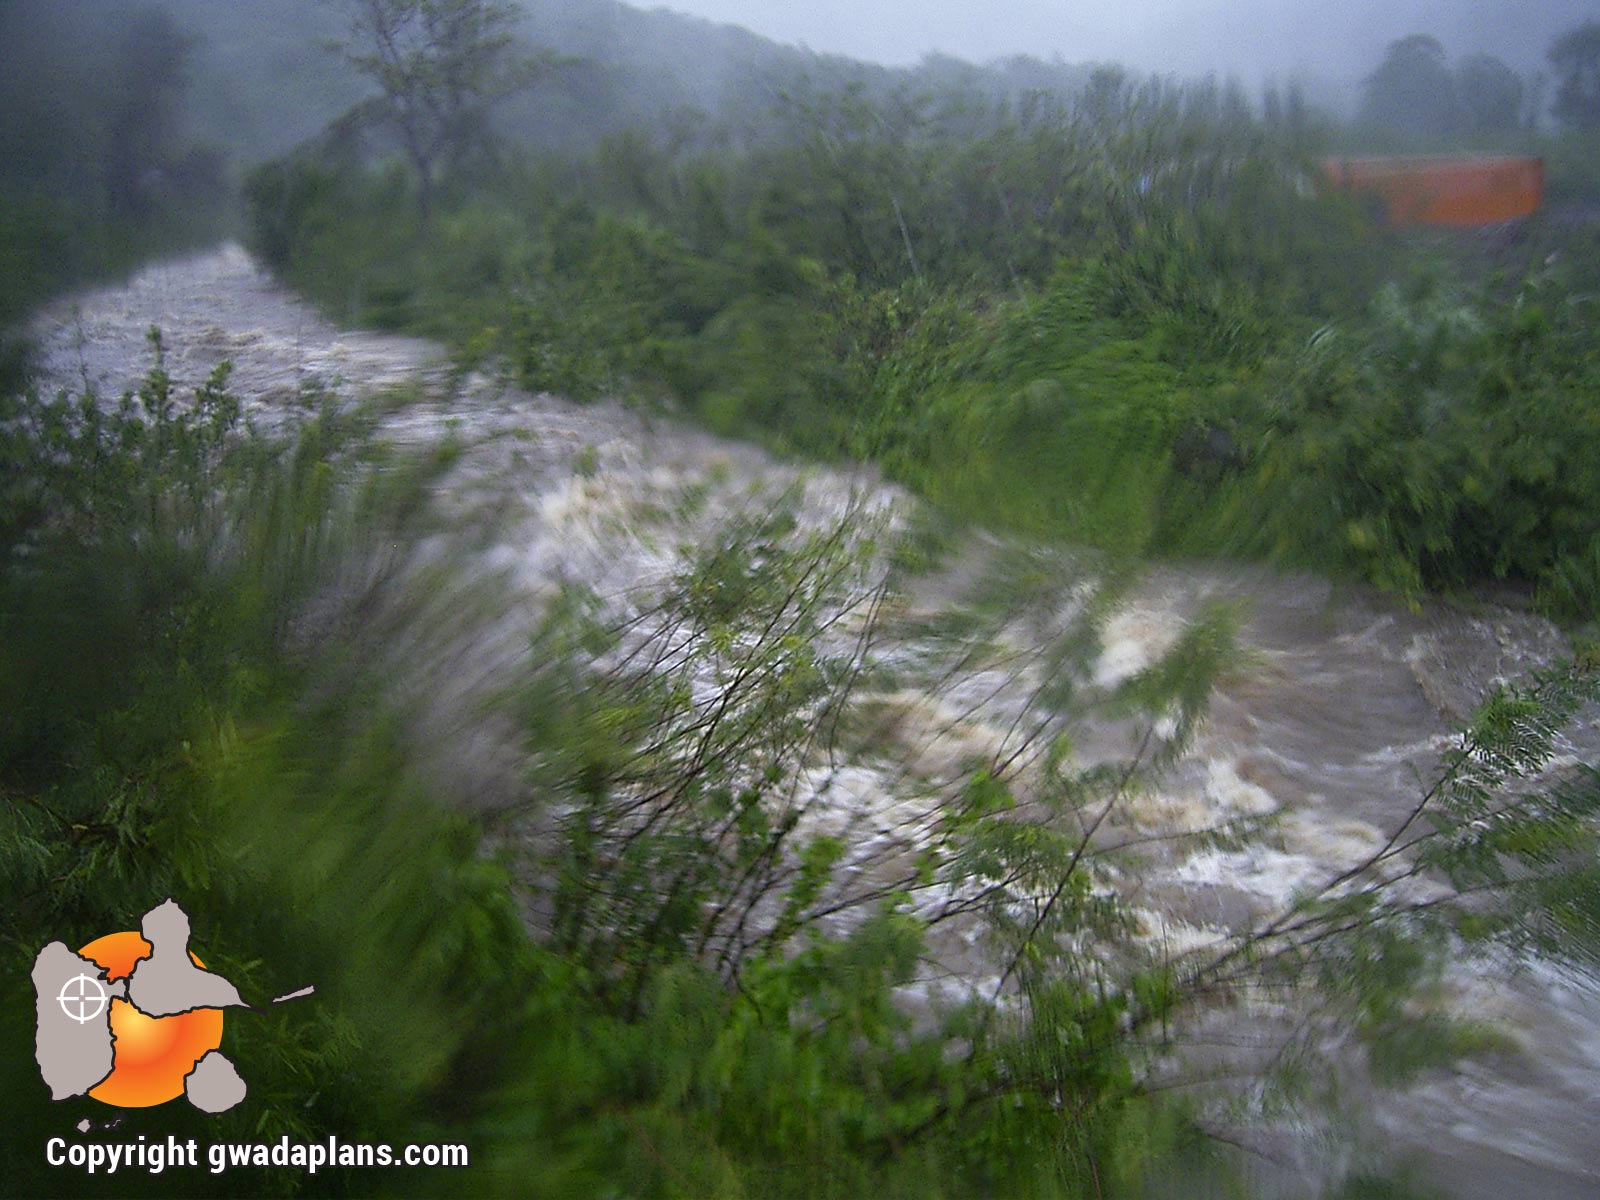 Crue de rivière - Ouragan catégorie 2 - Dean 2007